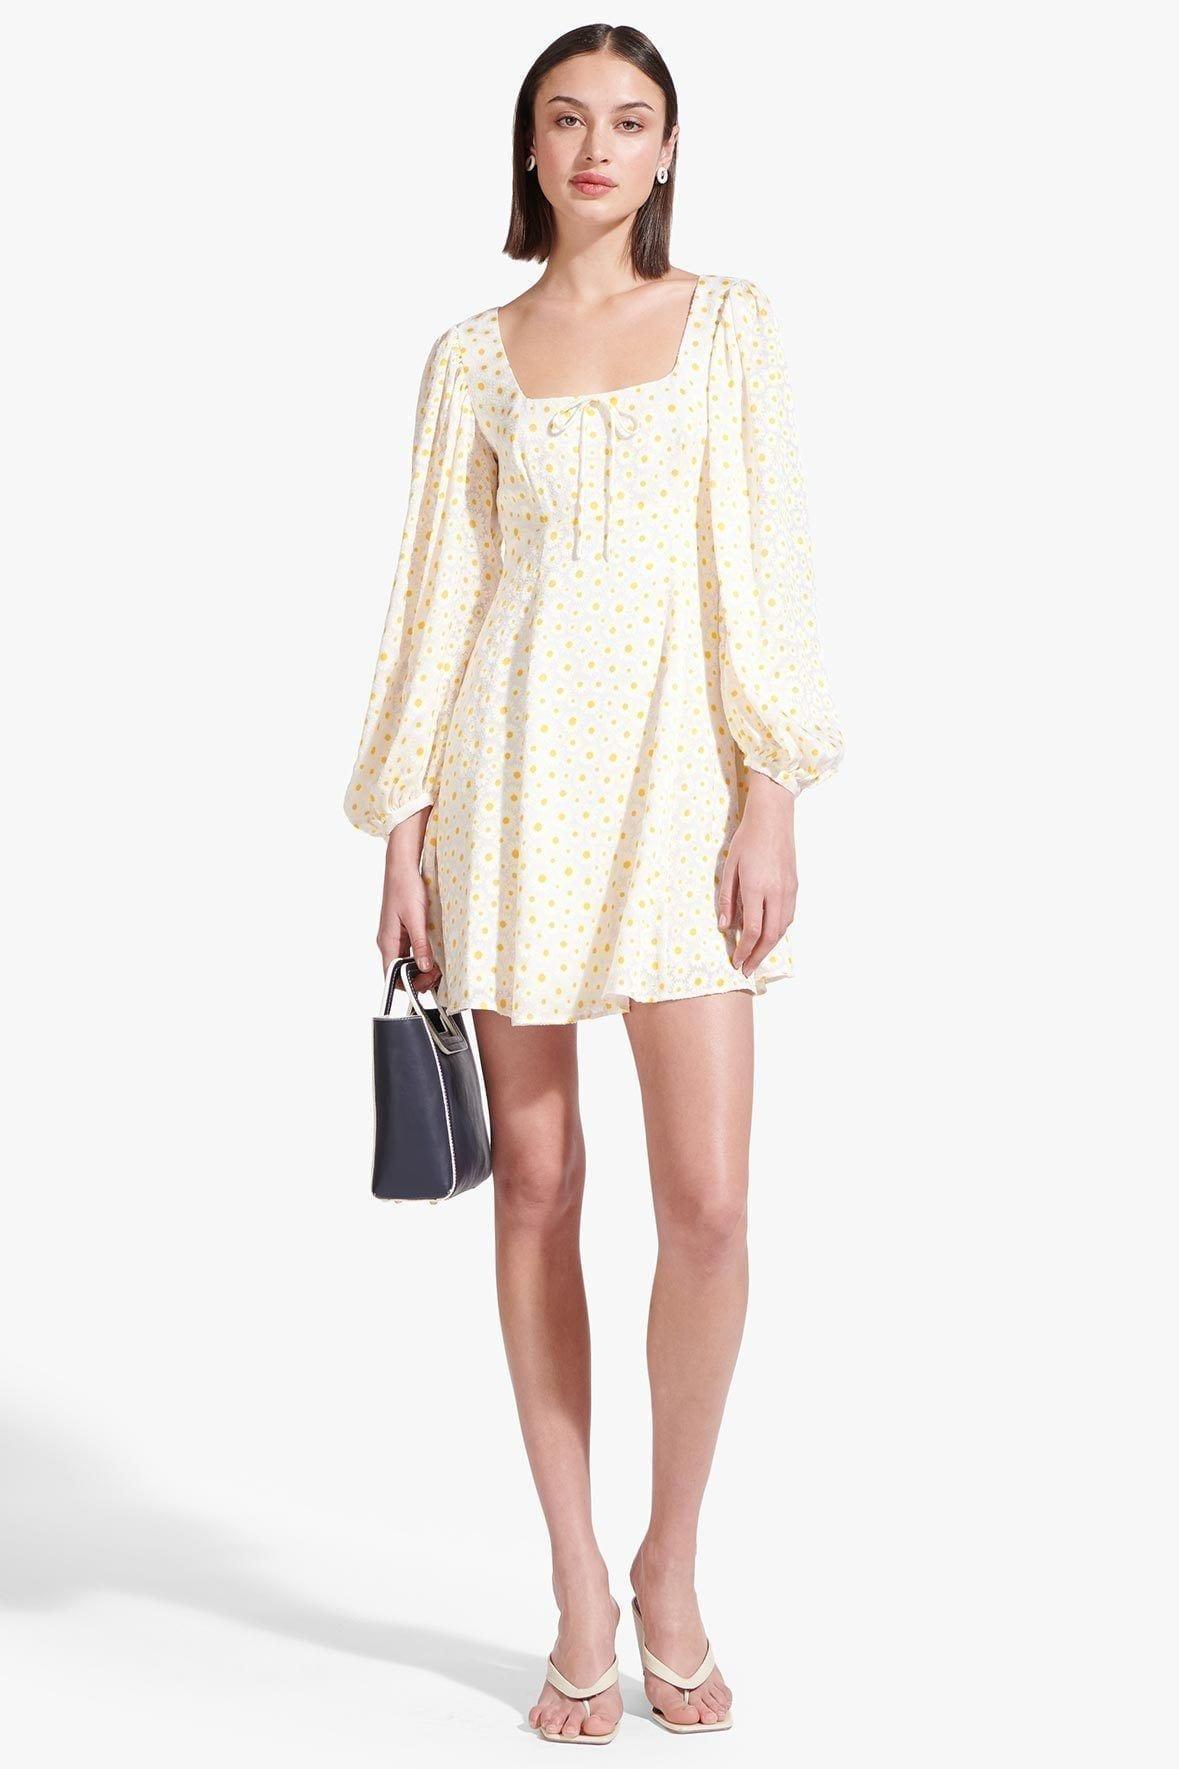 STAUD Juniper Dress